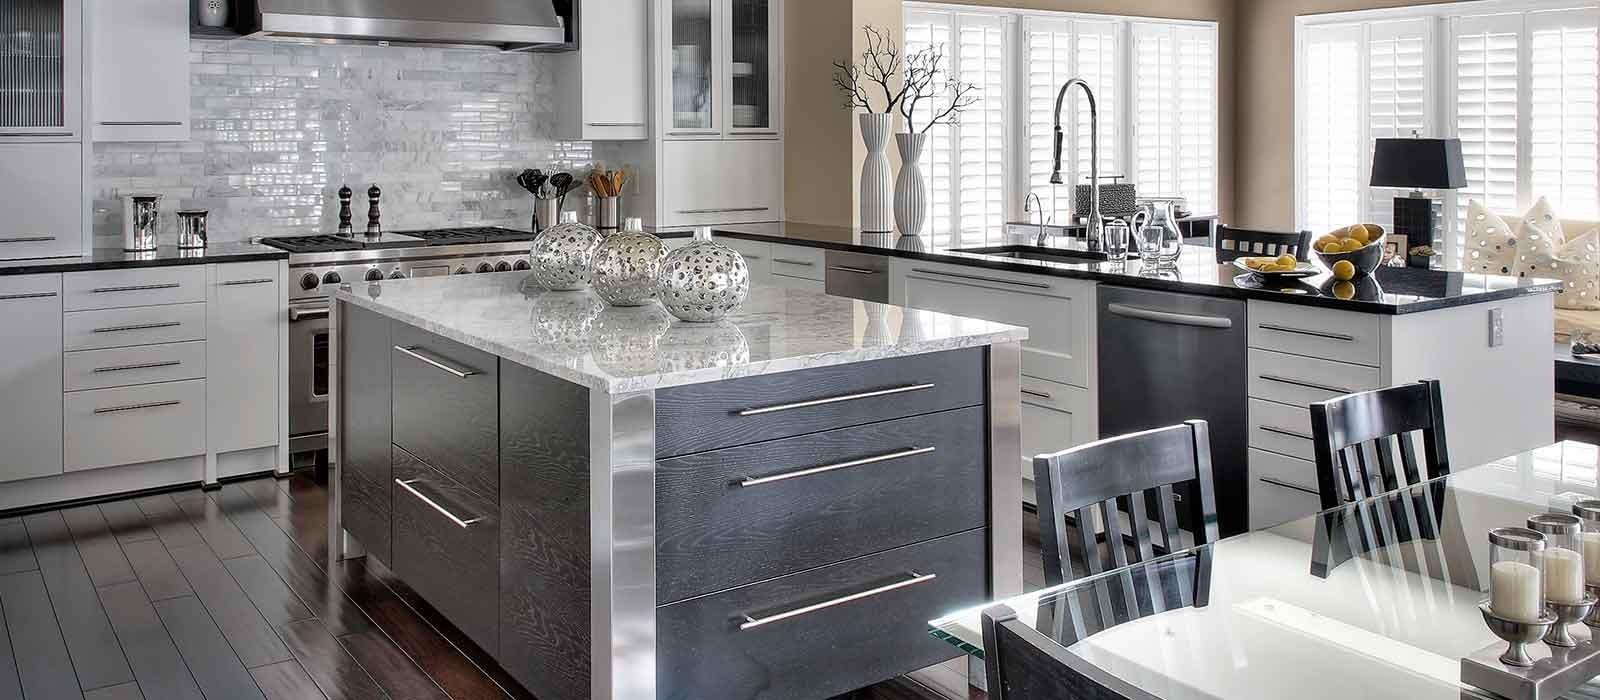 ... Capitol Design Award Winning Kitchen Bathroom Design Remodel  ...